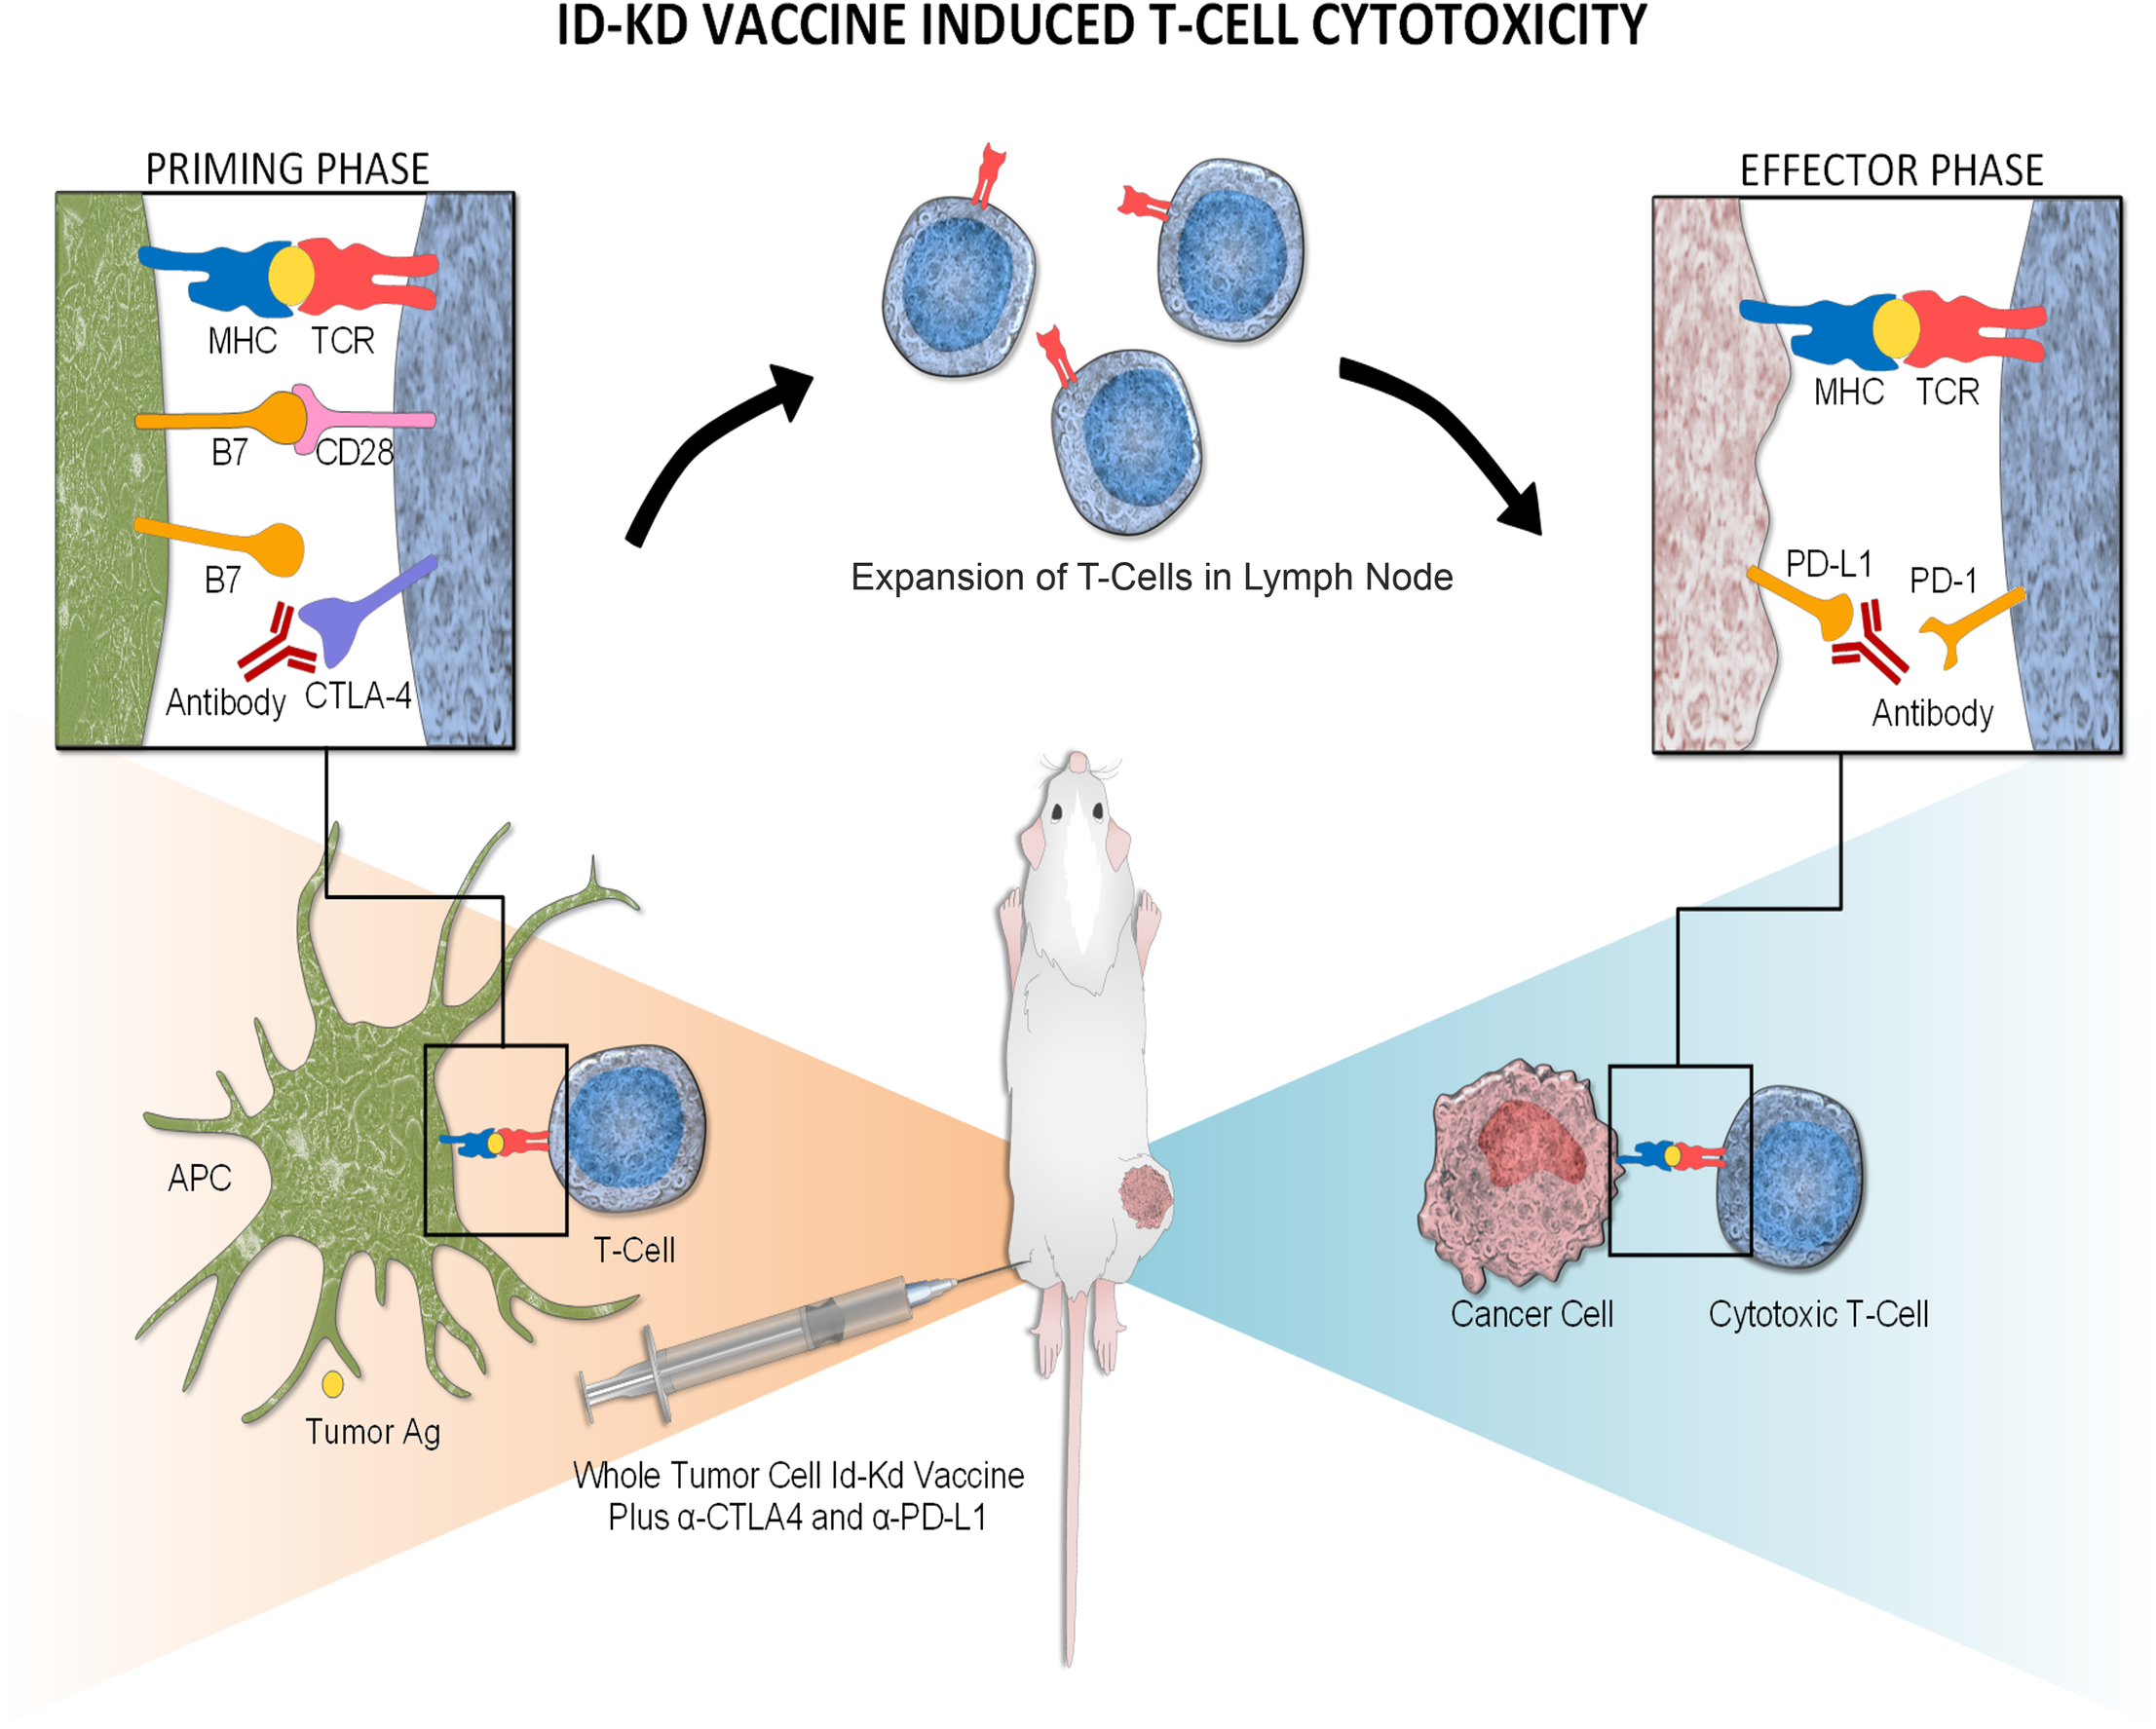 Mechanism of Id2kd Neuro2a vaccination combined with α-CTLA-4 and α-PD-L1 immunotherapy in the immunogenic Neuro2a model.